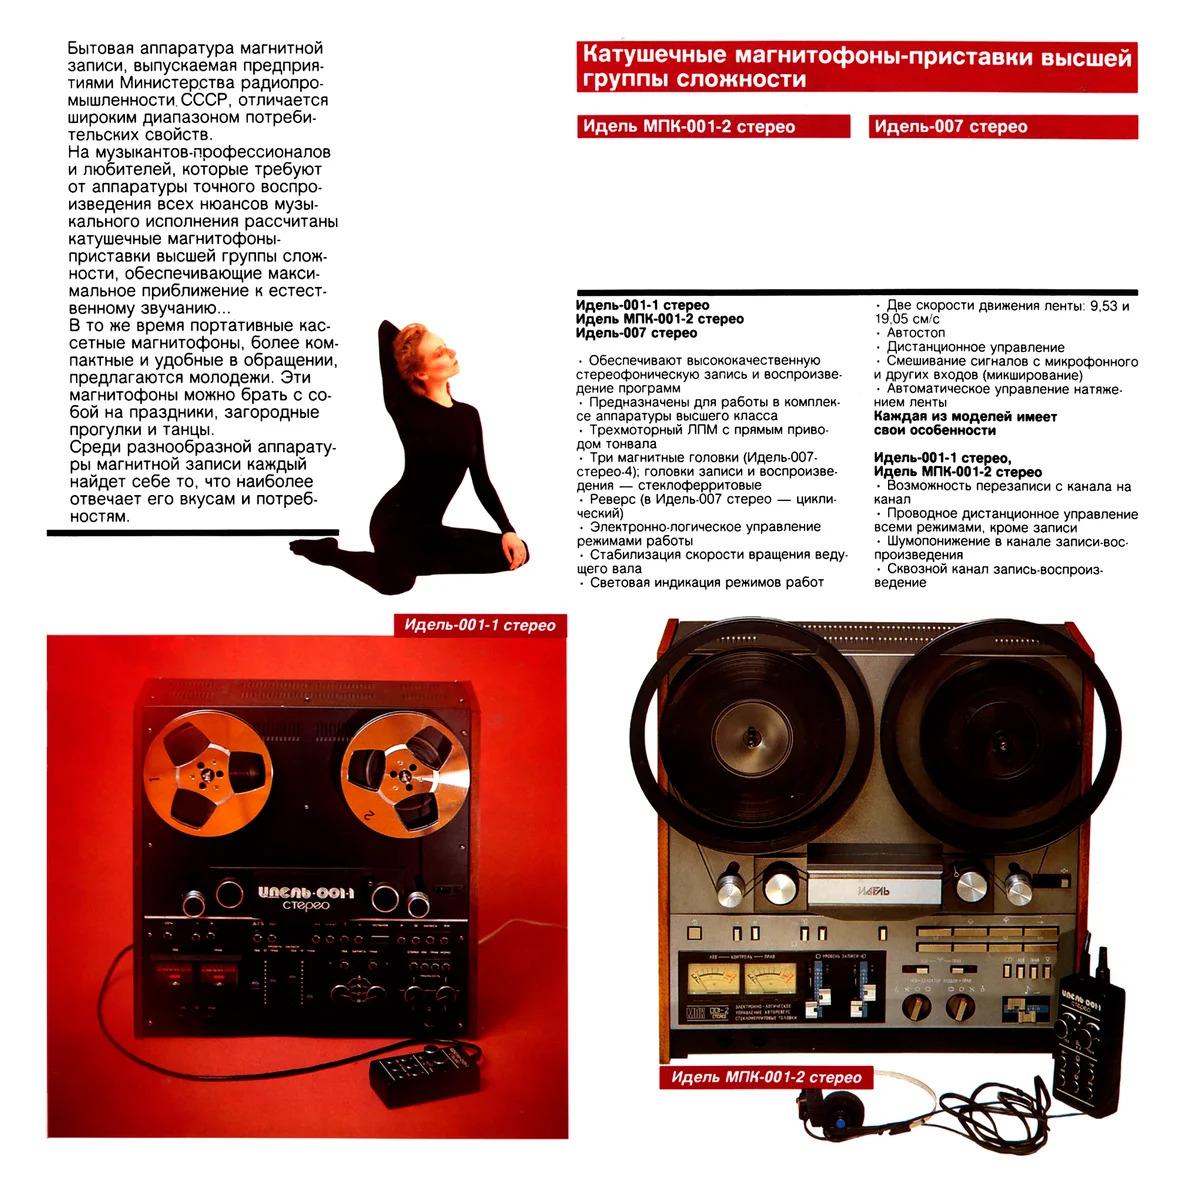 Каталог радиоаппаратуры СССР 1989 года.